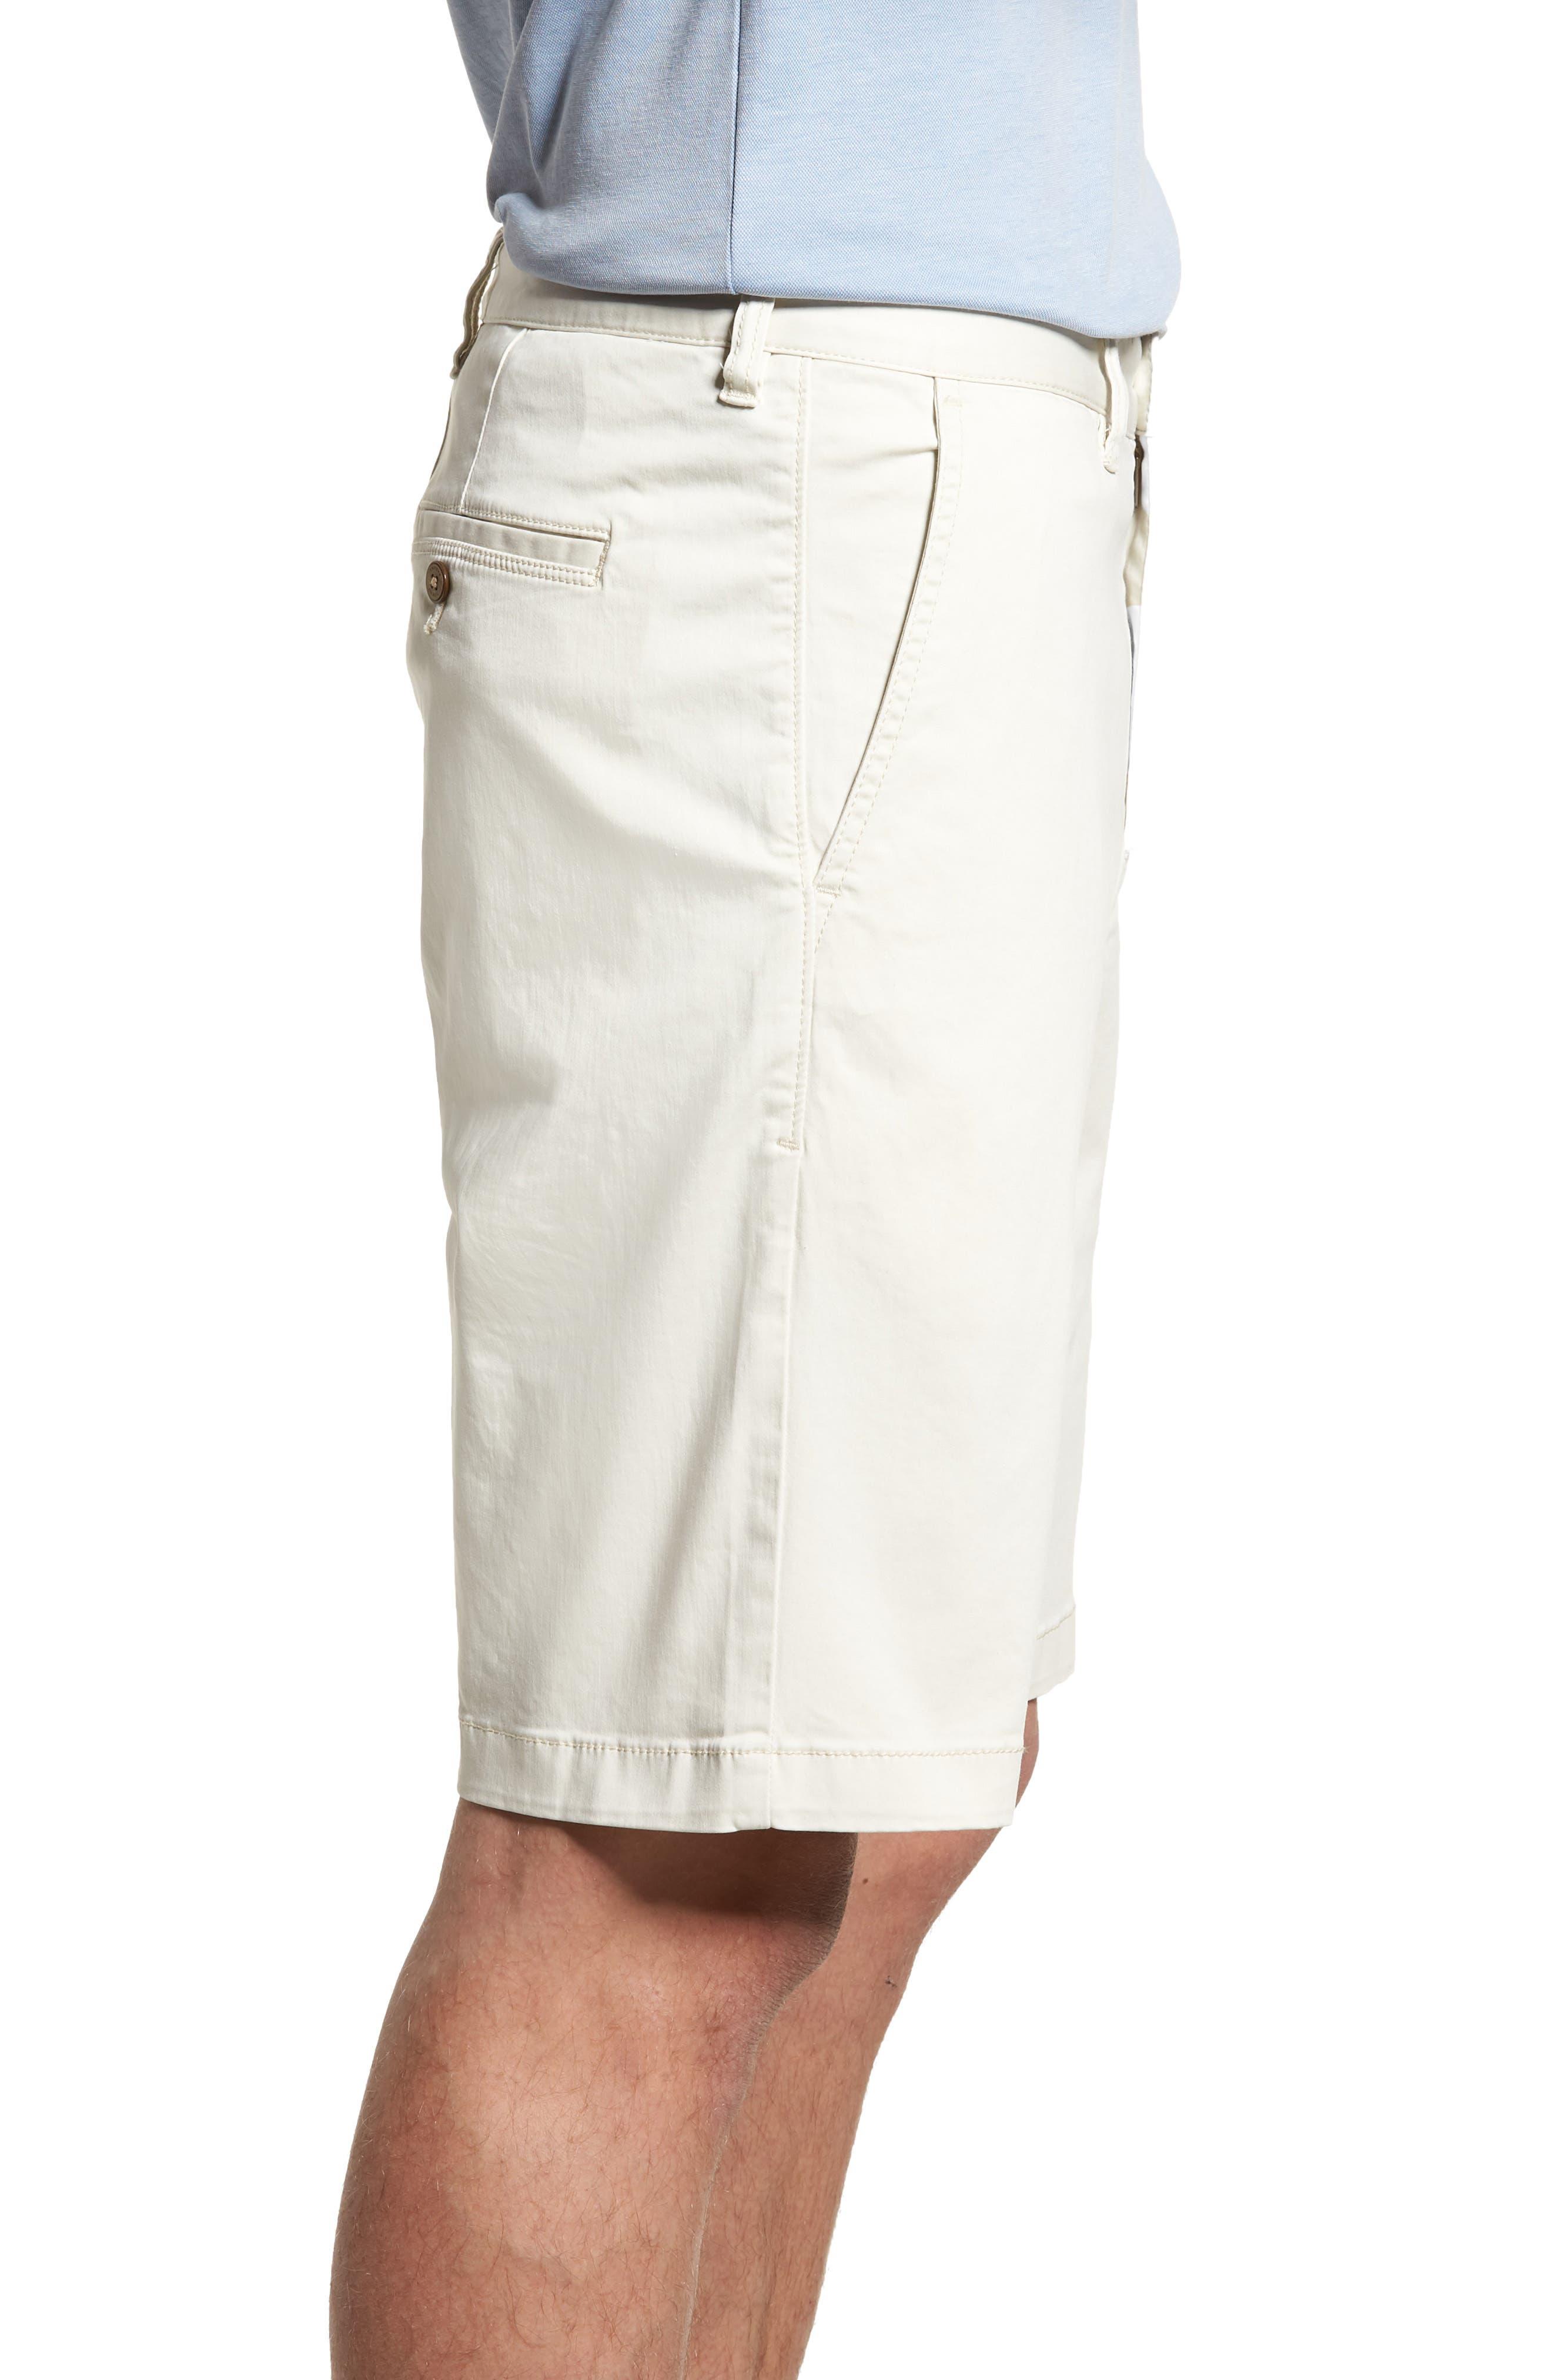 Boracay Chino Shorts,                             Alternate thumbnail 20, color,